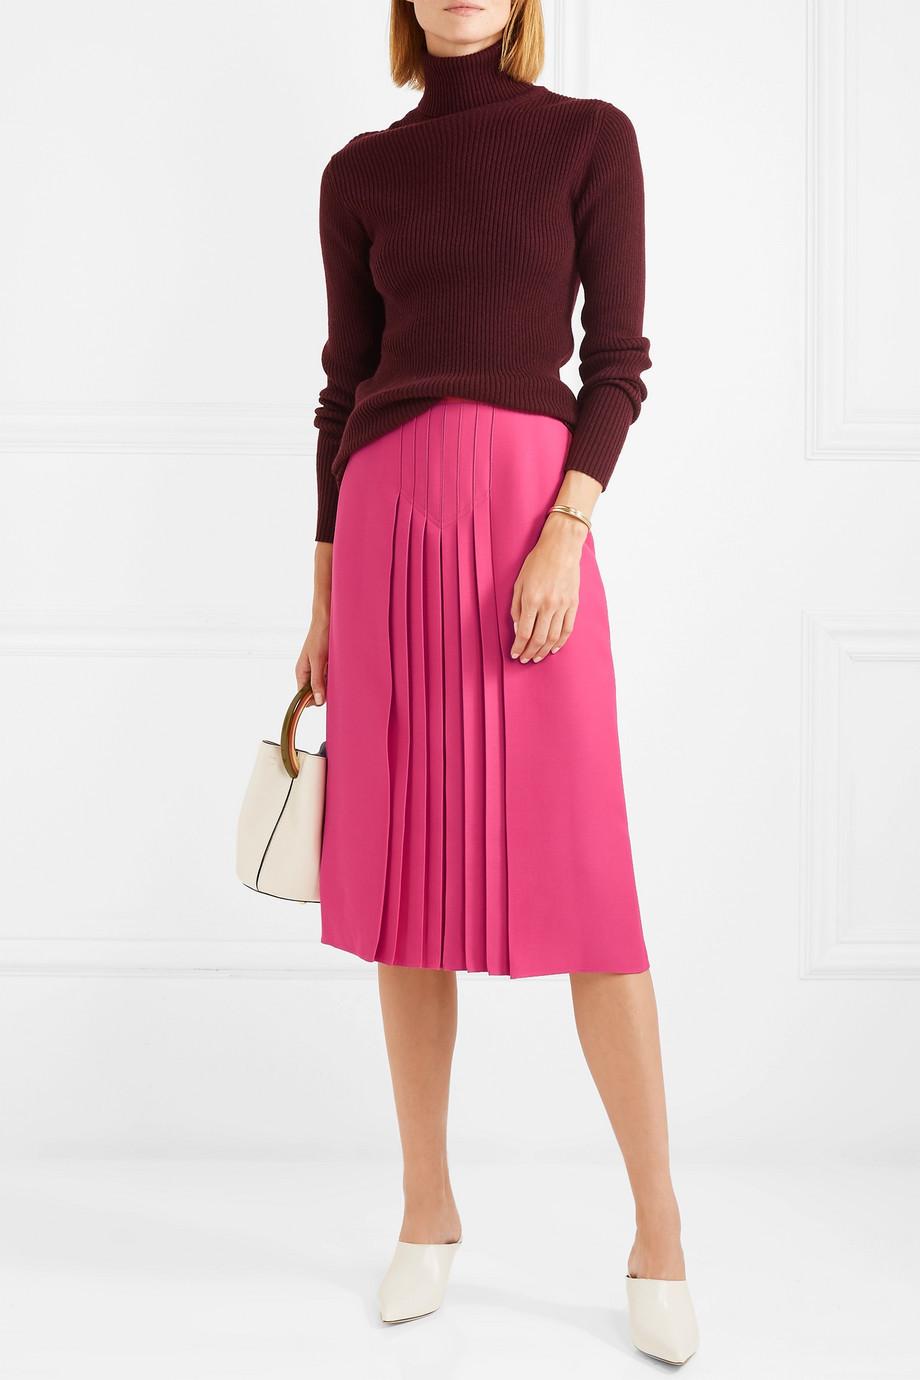 Valentino Pleated silk and wool-blend midi skirt $2,590